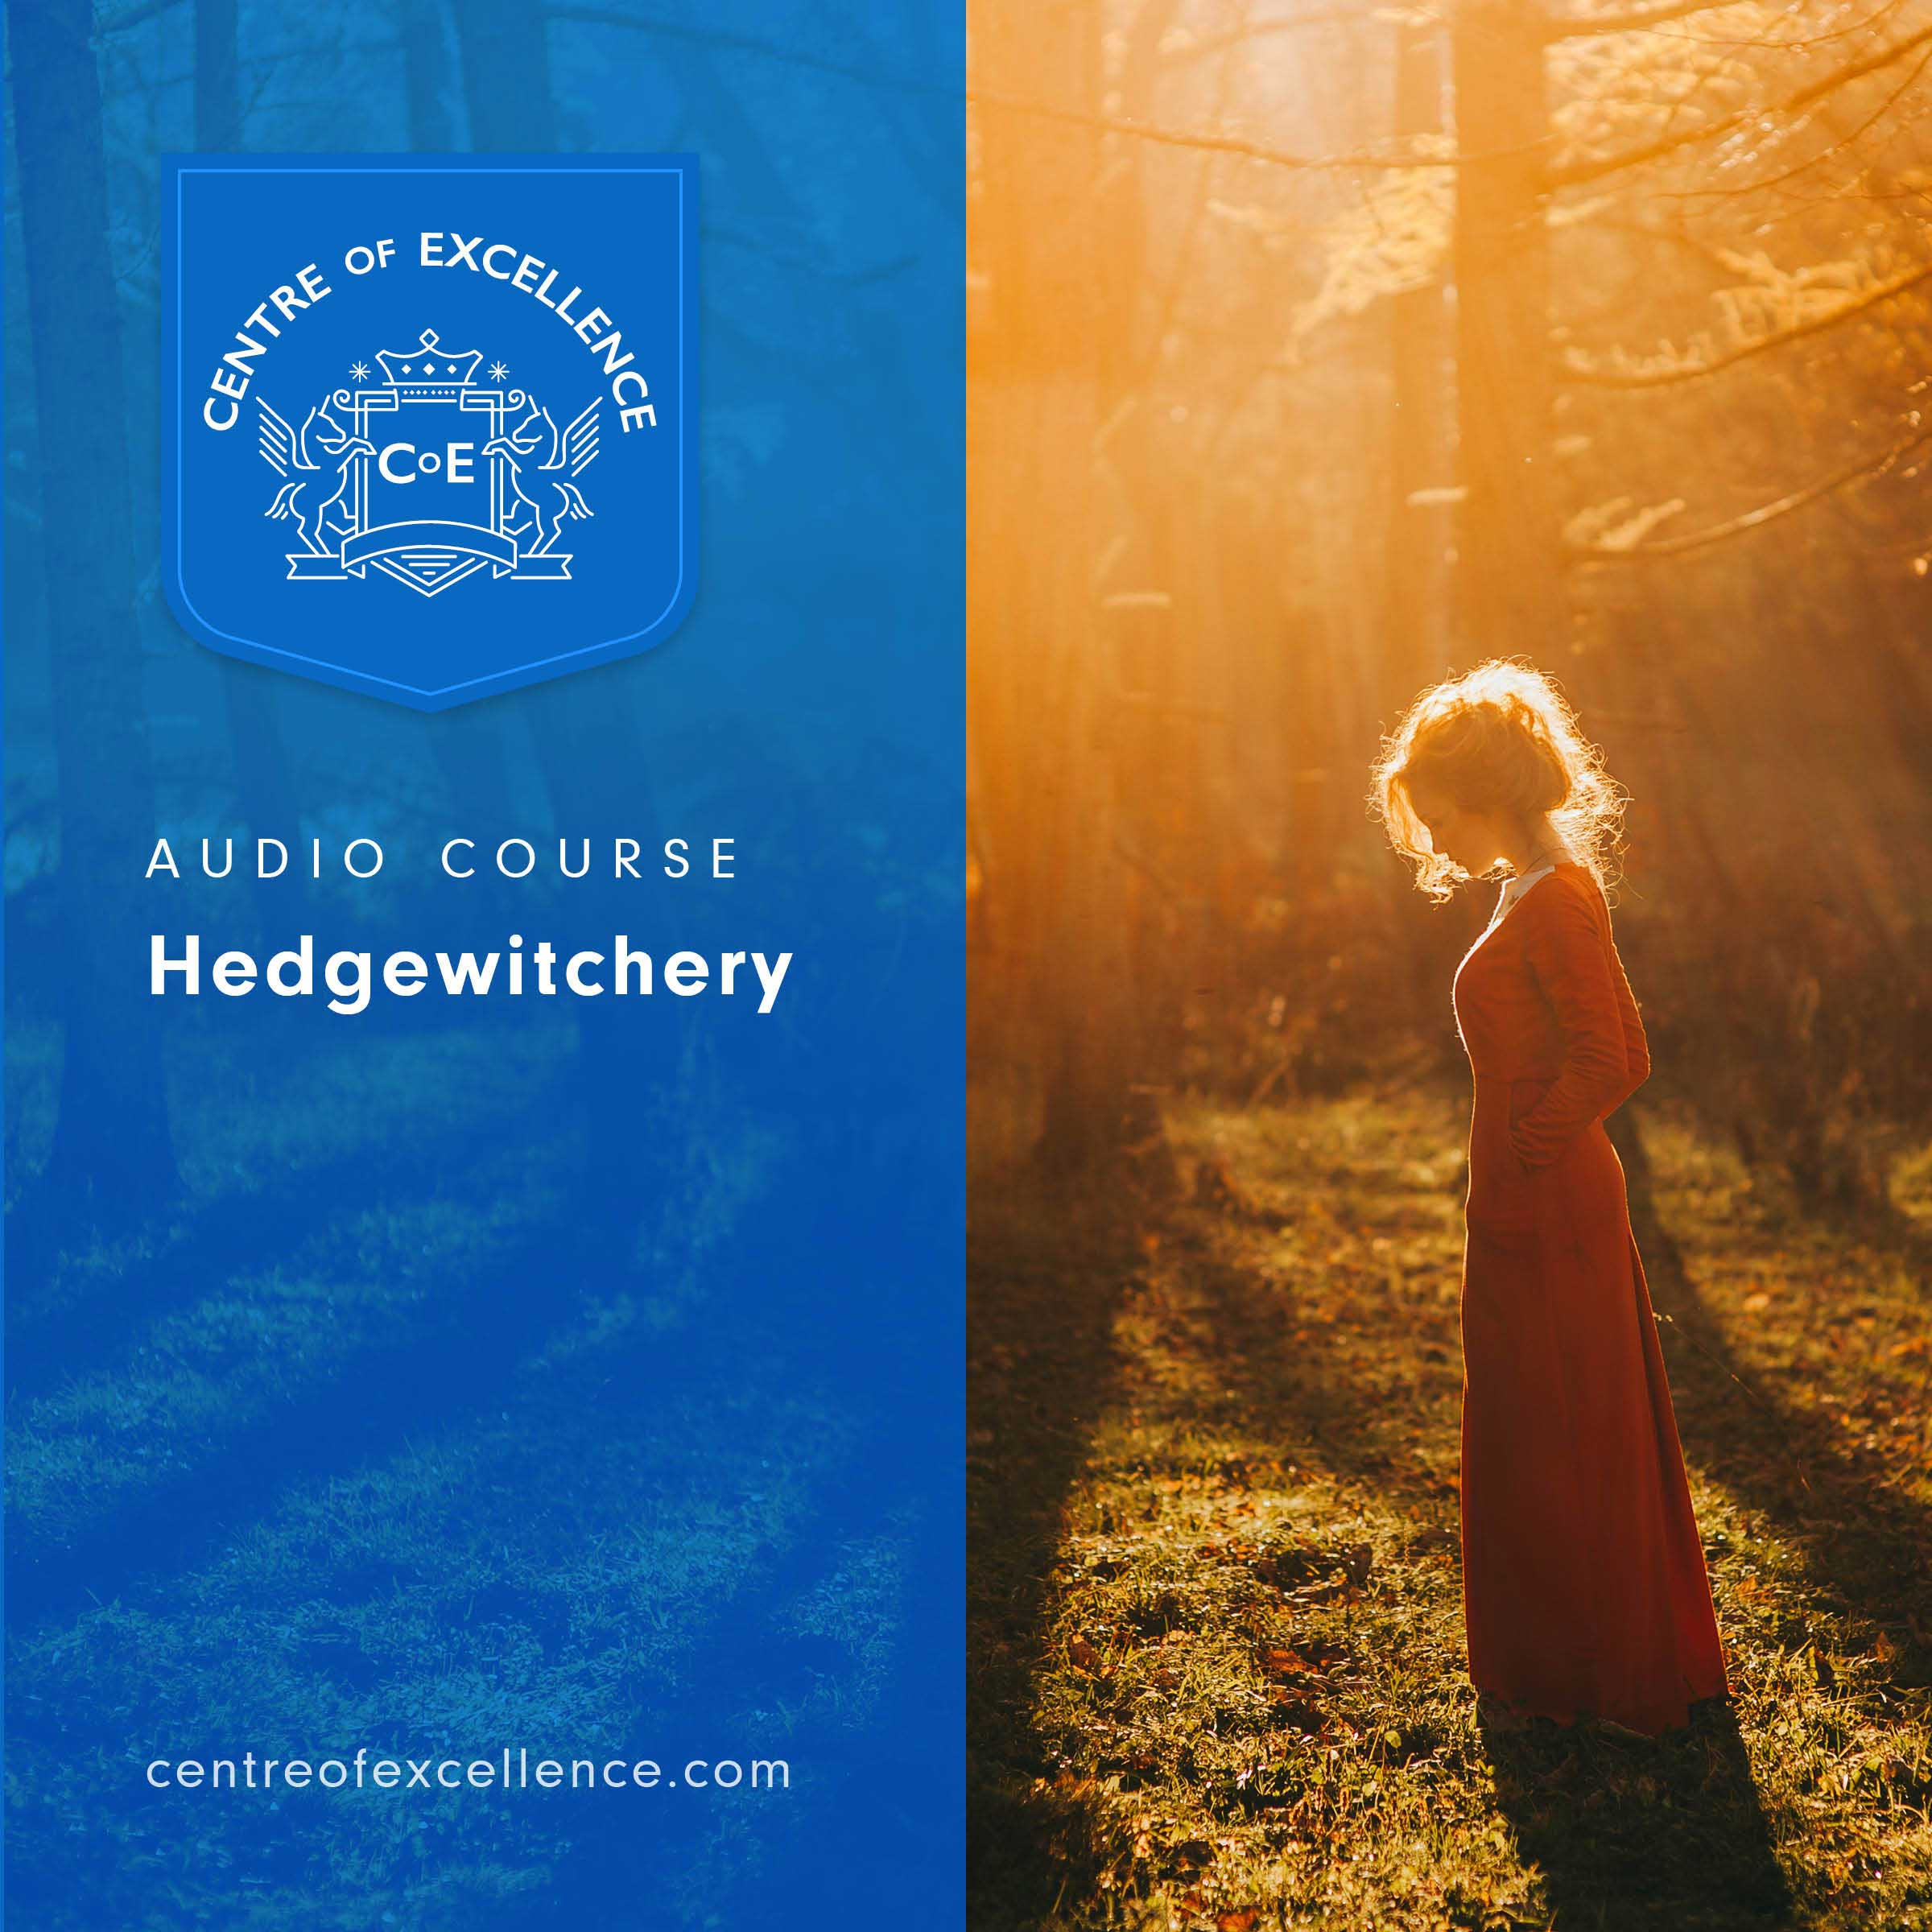 Hedgewitchery Audio Course